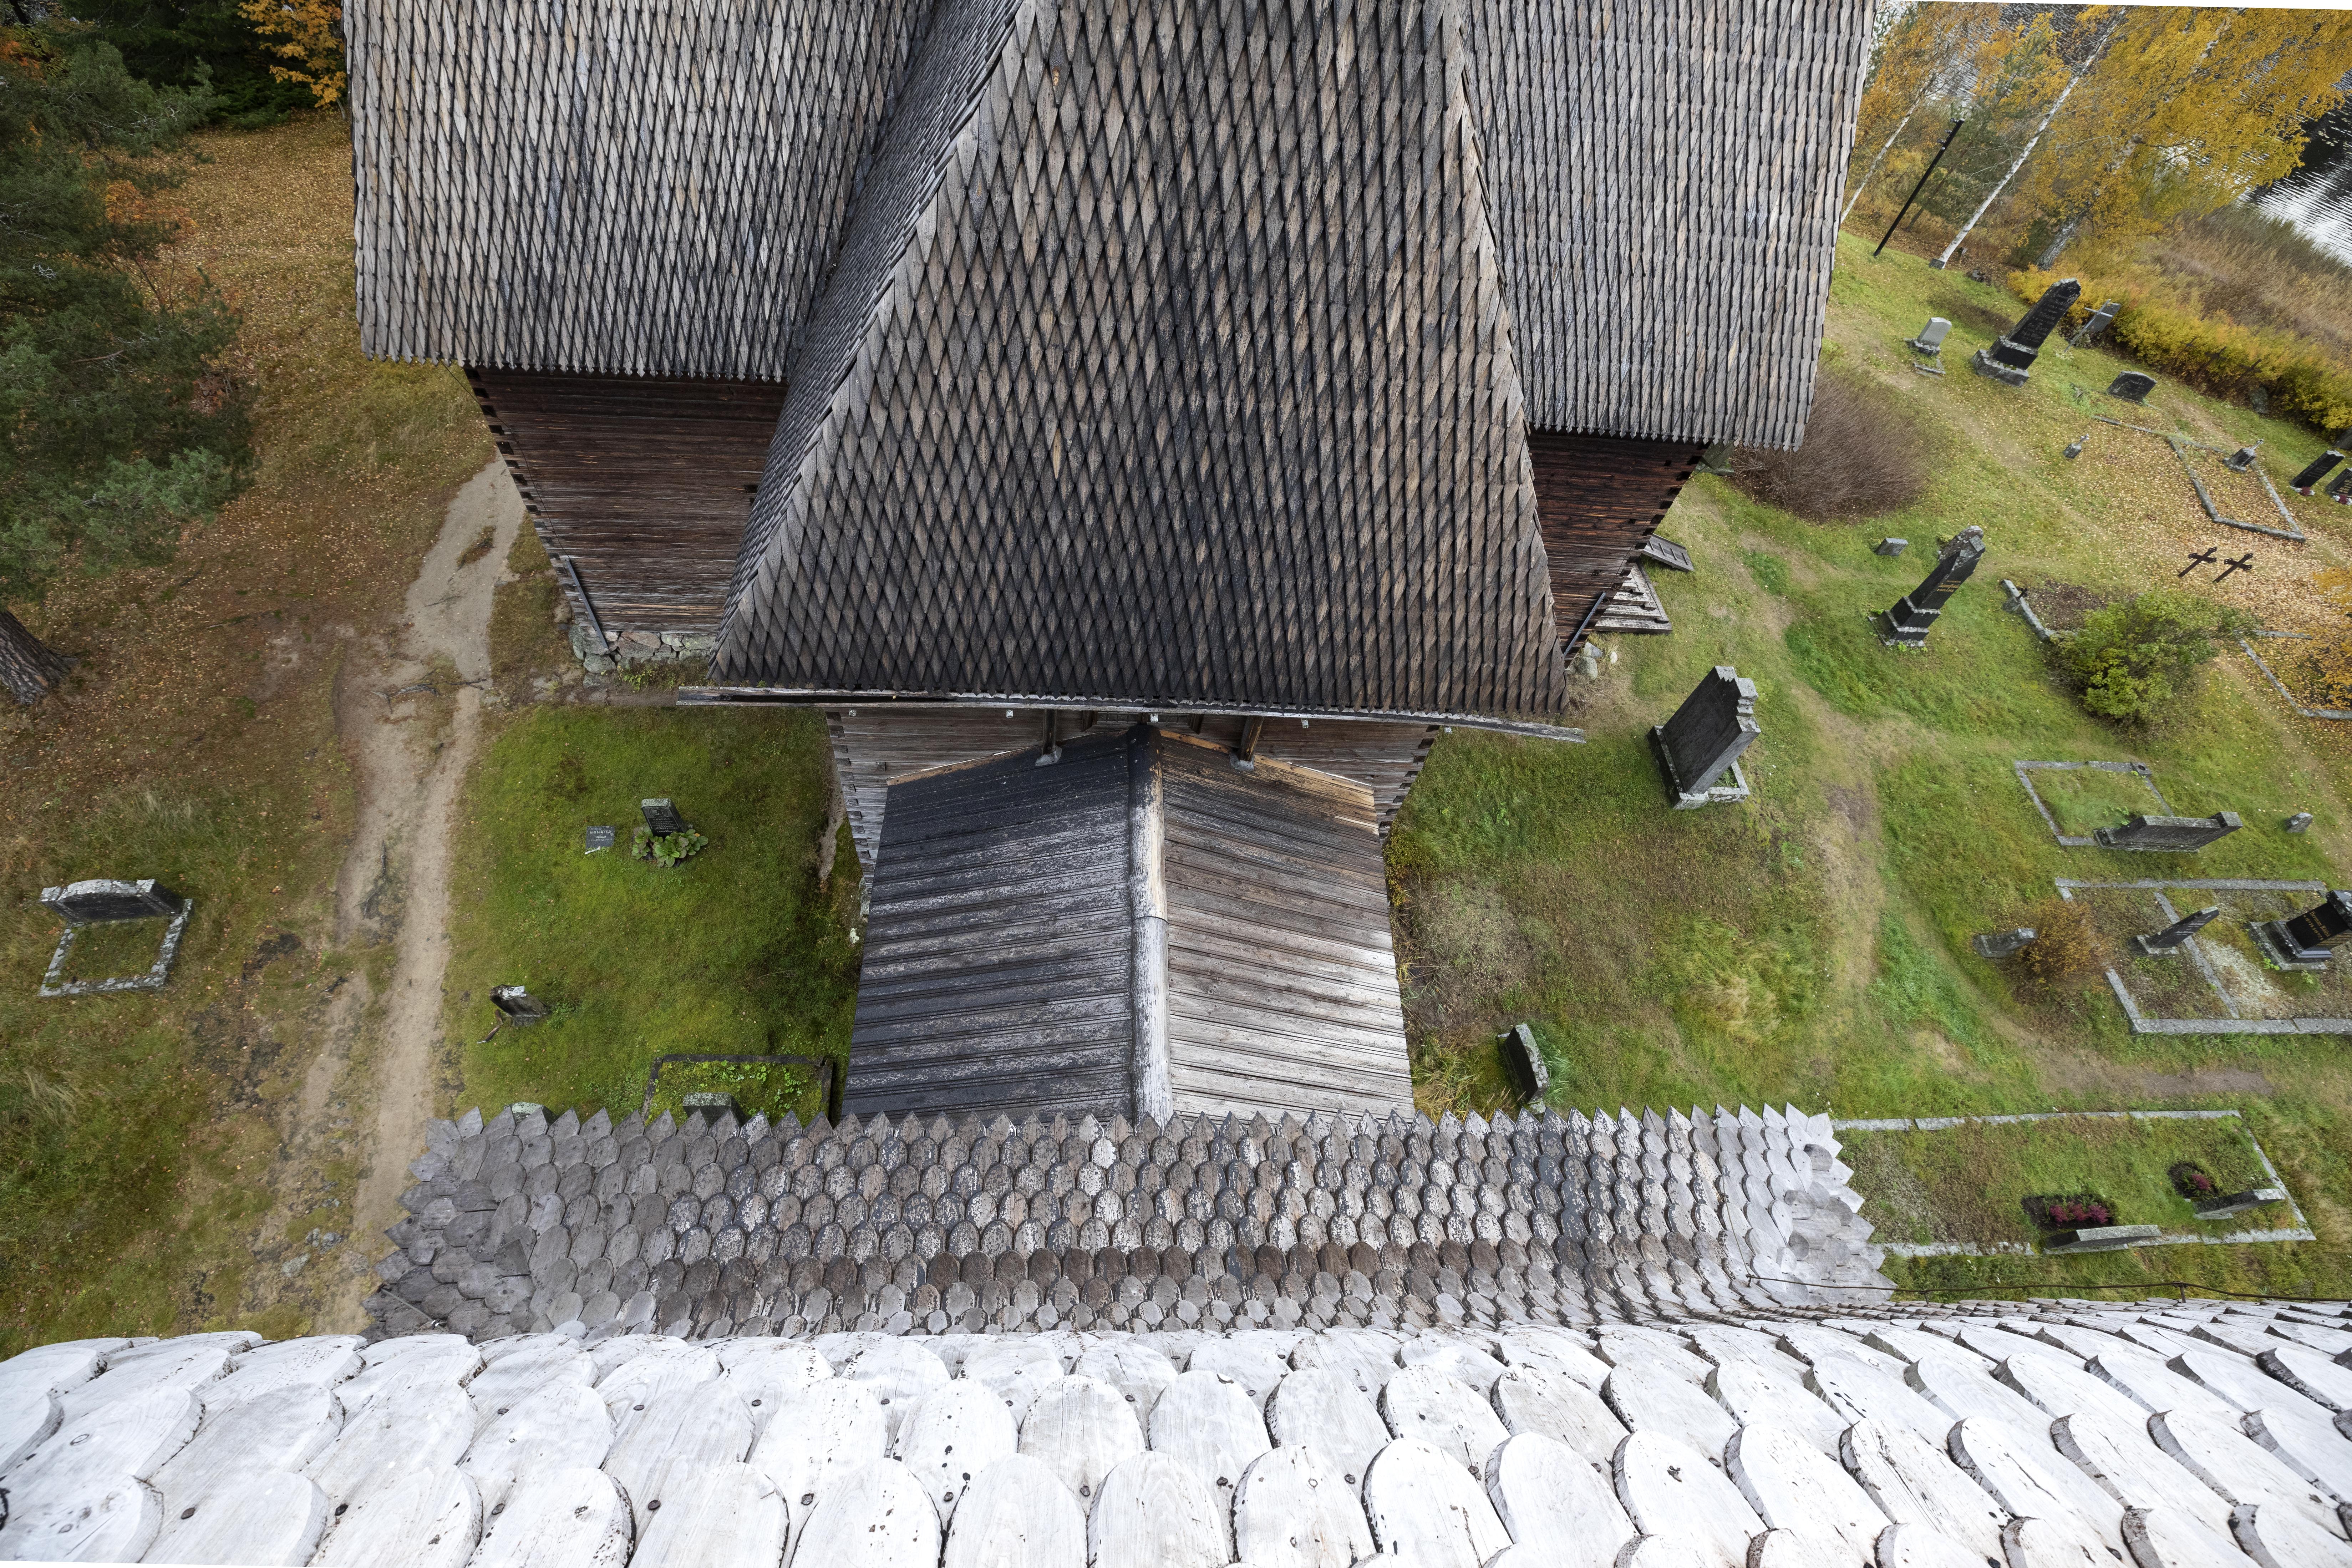 Petäjävesi Old Church from above